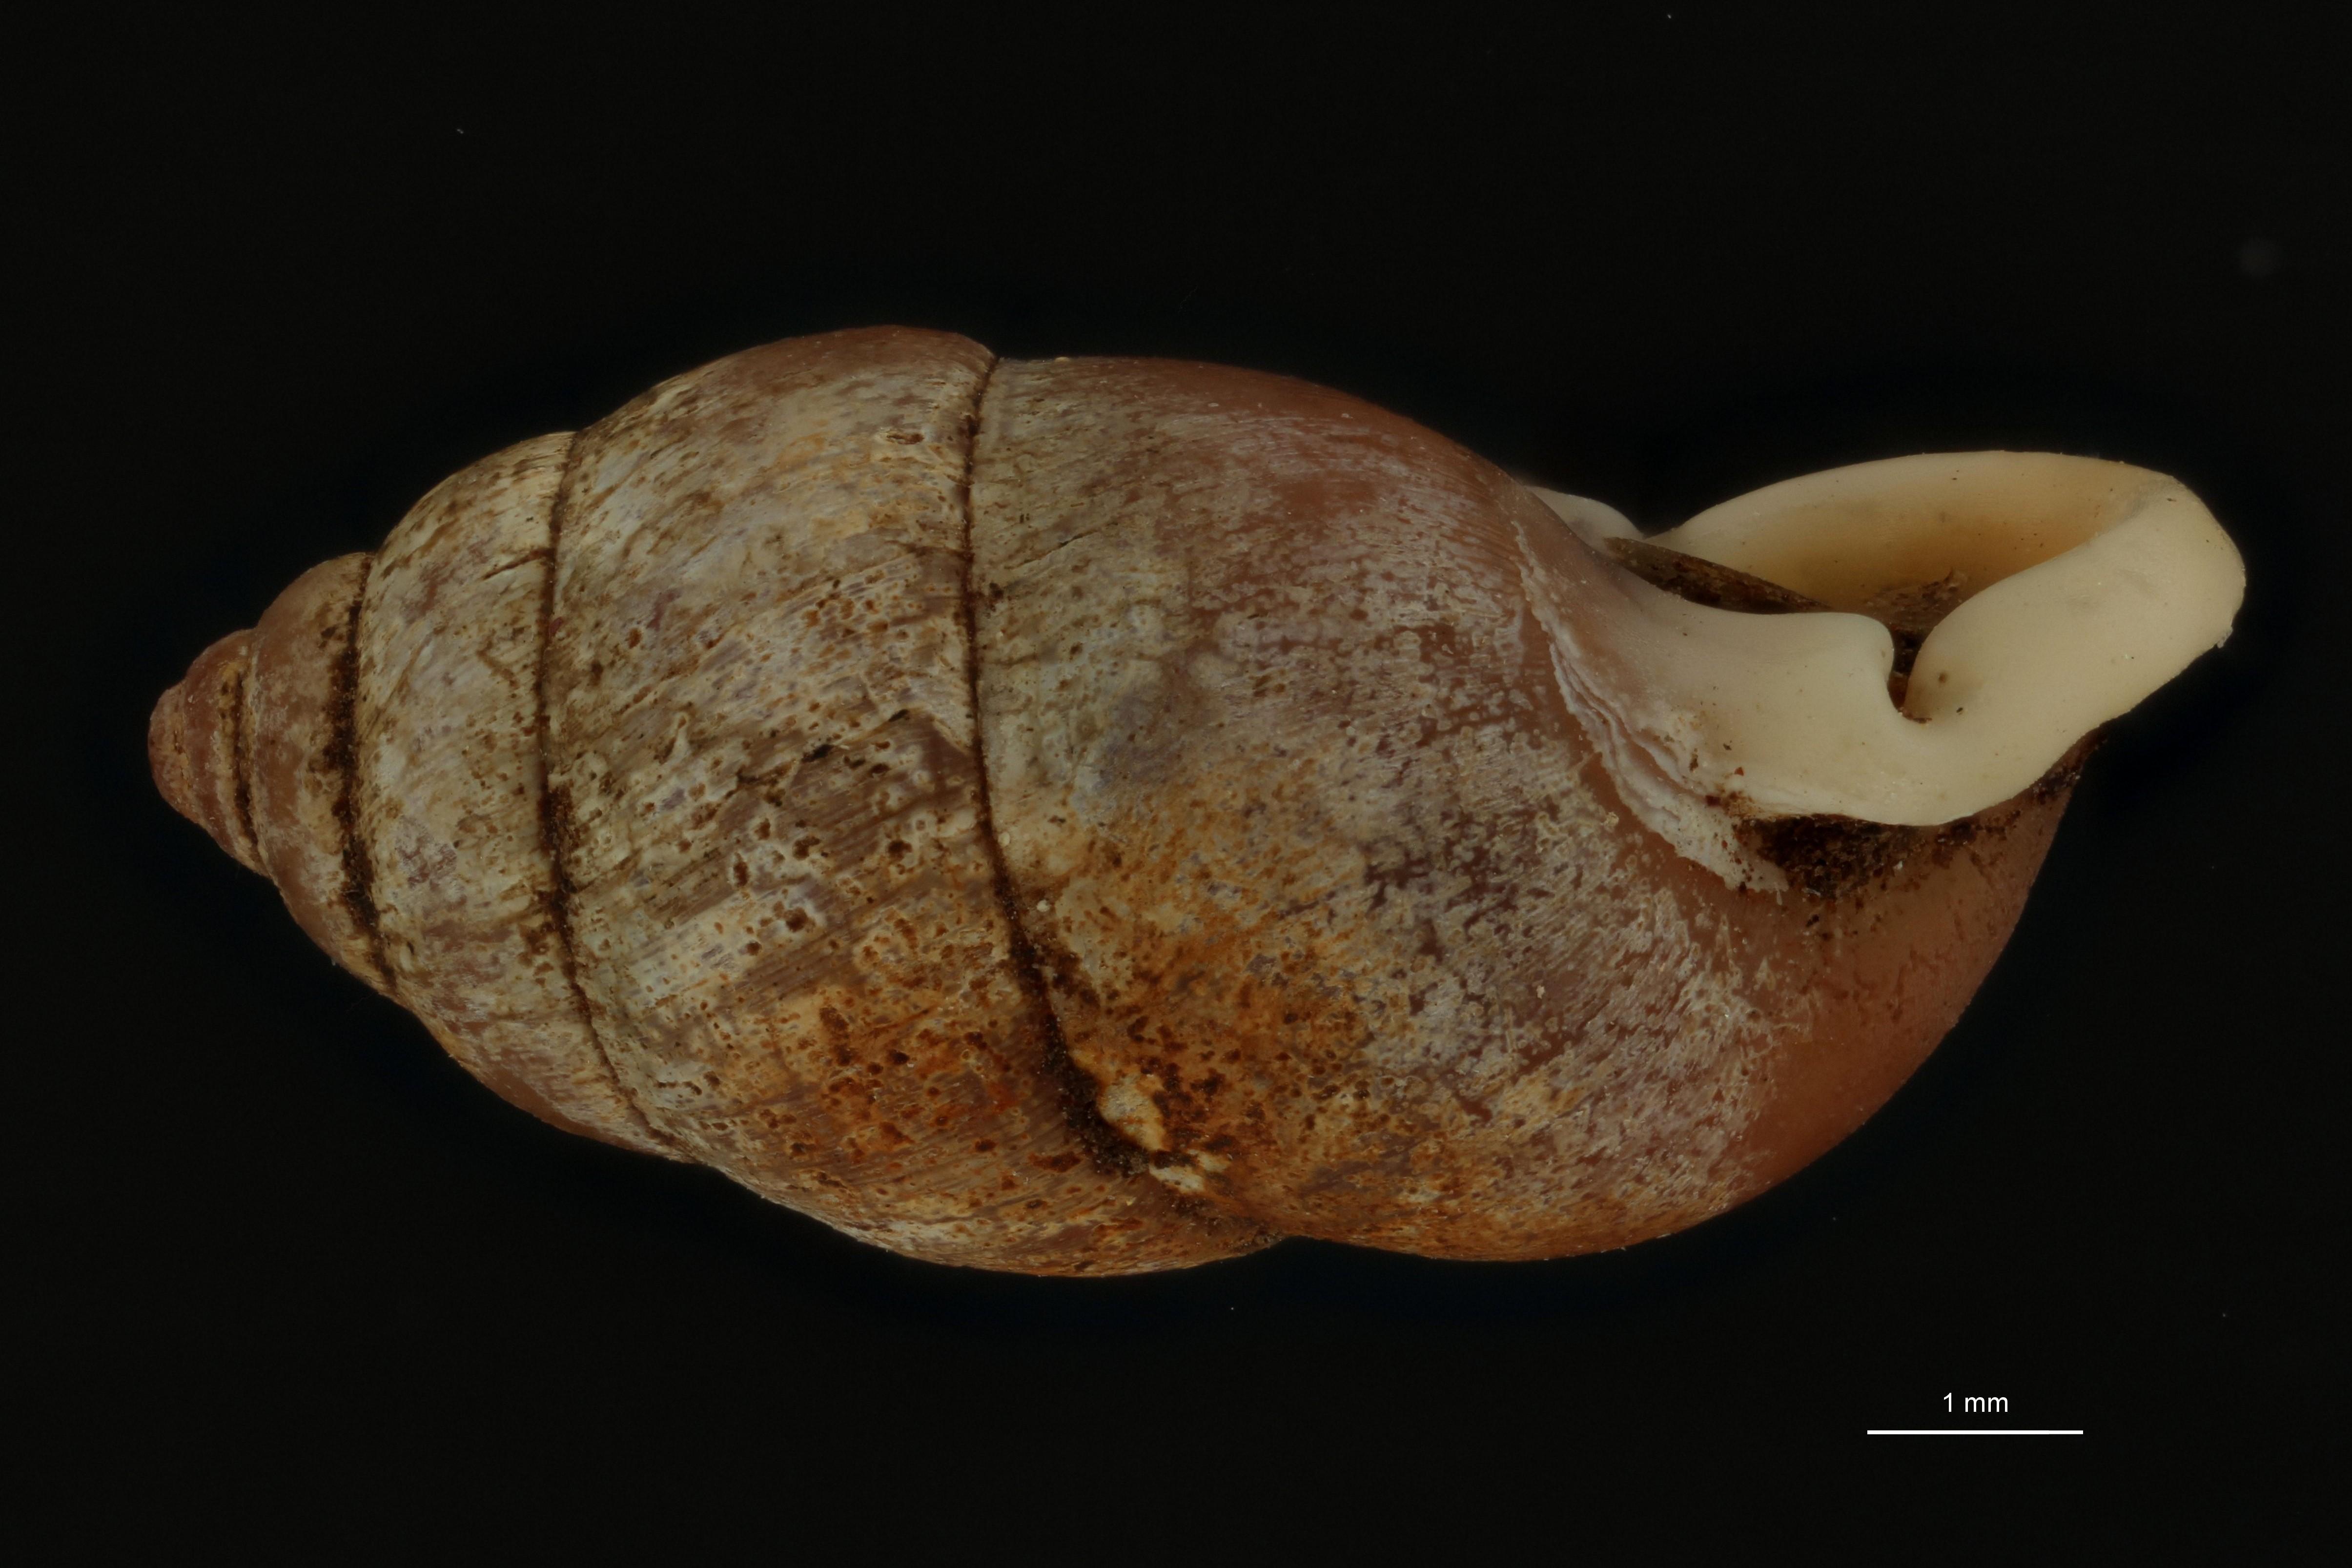 BE-RBINS-INV MT 960 Pupinella (Pupinopsis) rufa var. tanegashimae pt L.jpg